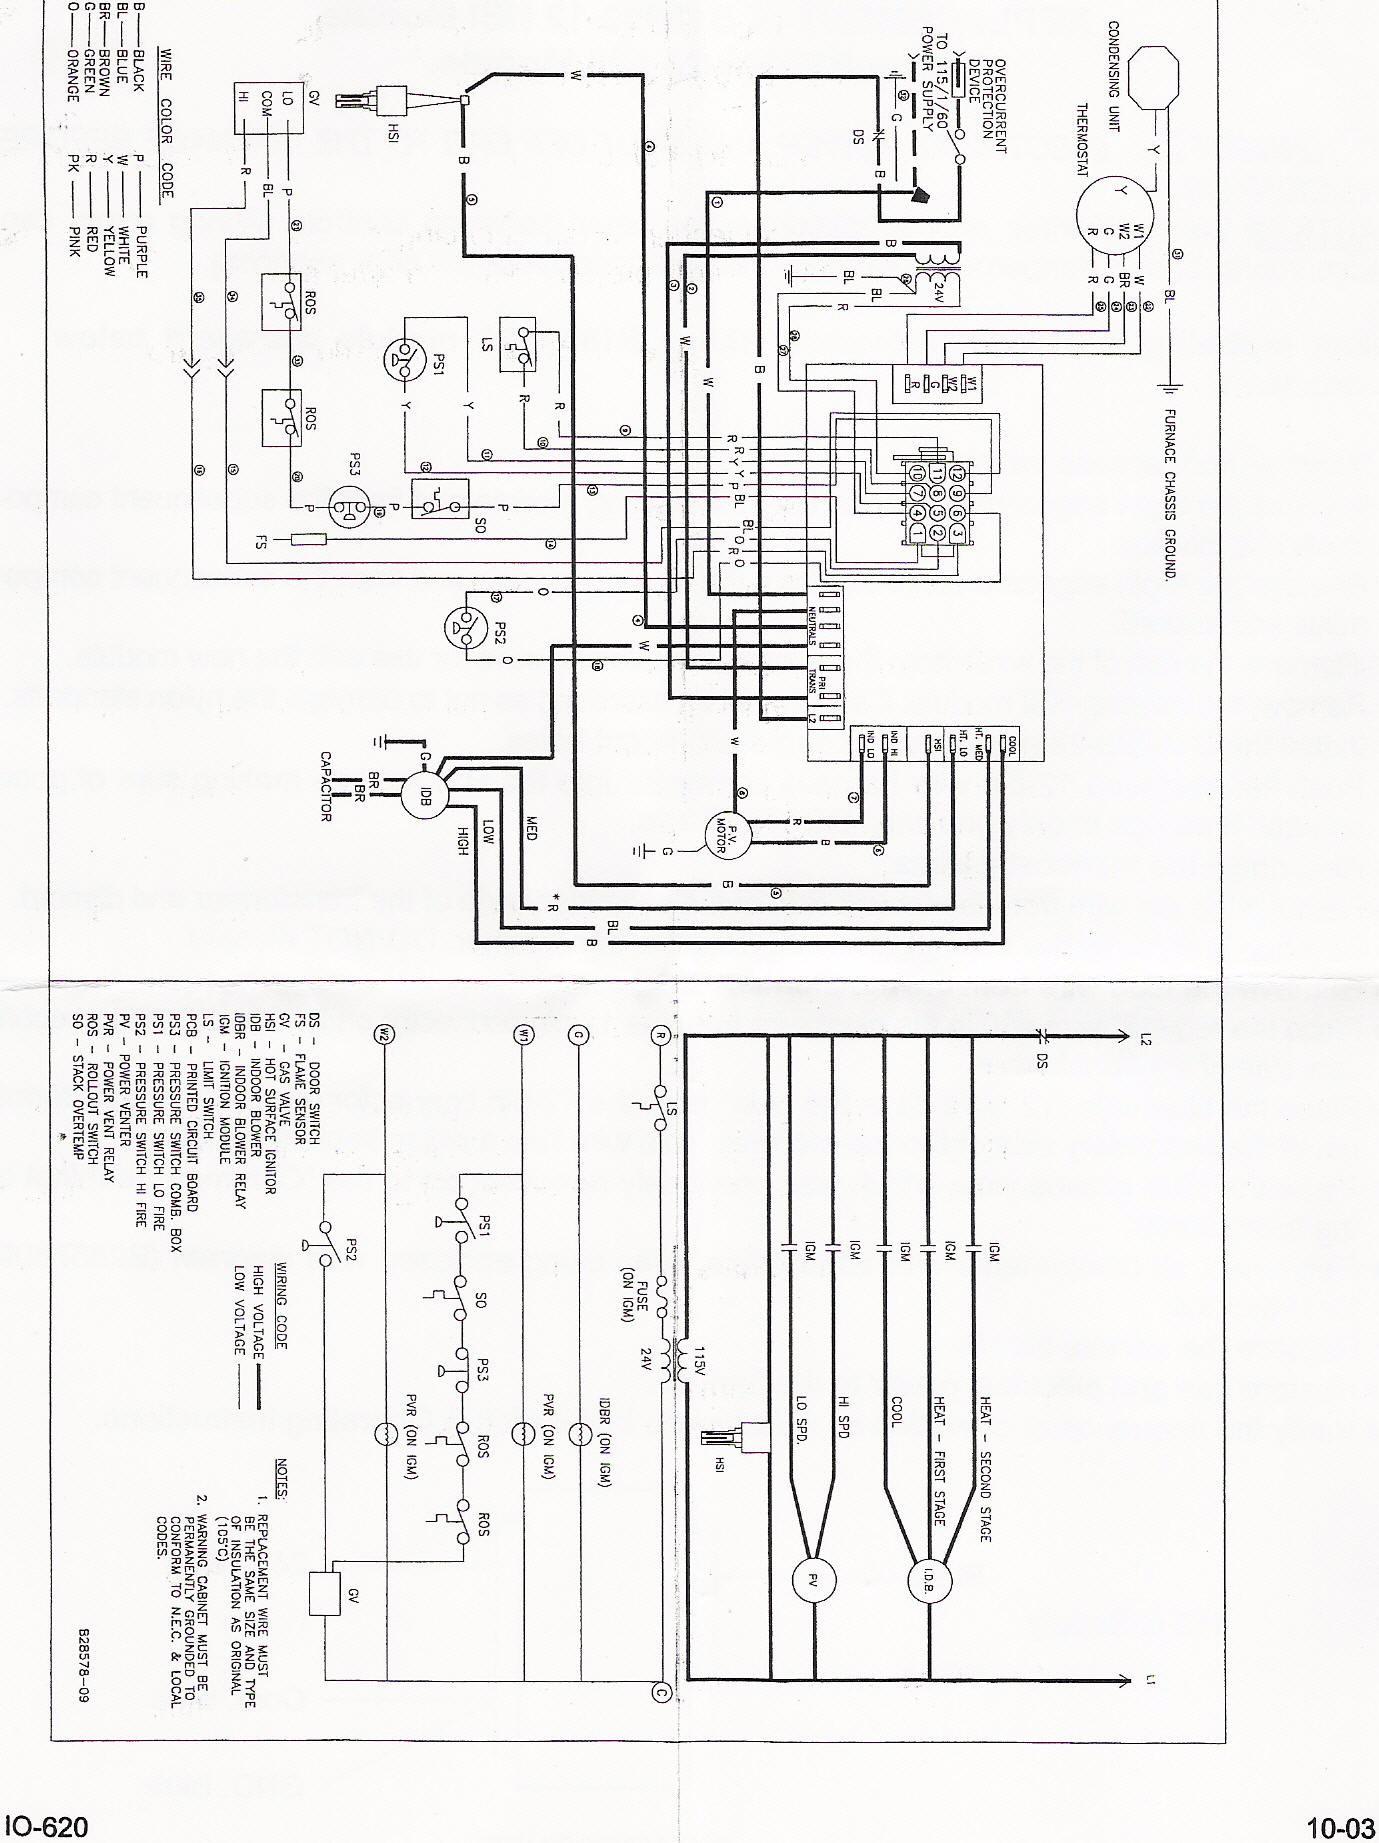 hight resolution of pump amana diagram wiring ptac heat wiring diagram amana hvac wiring diagrams